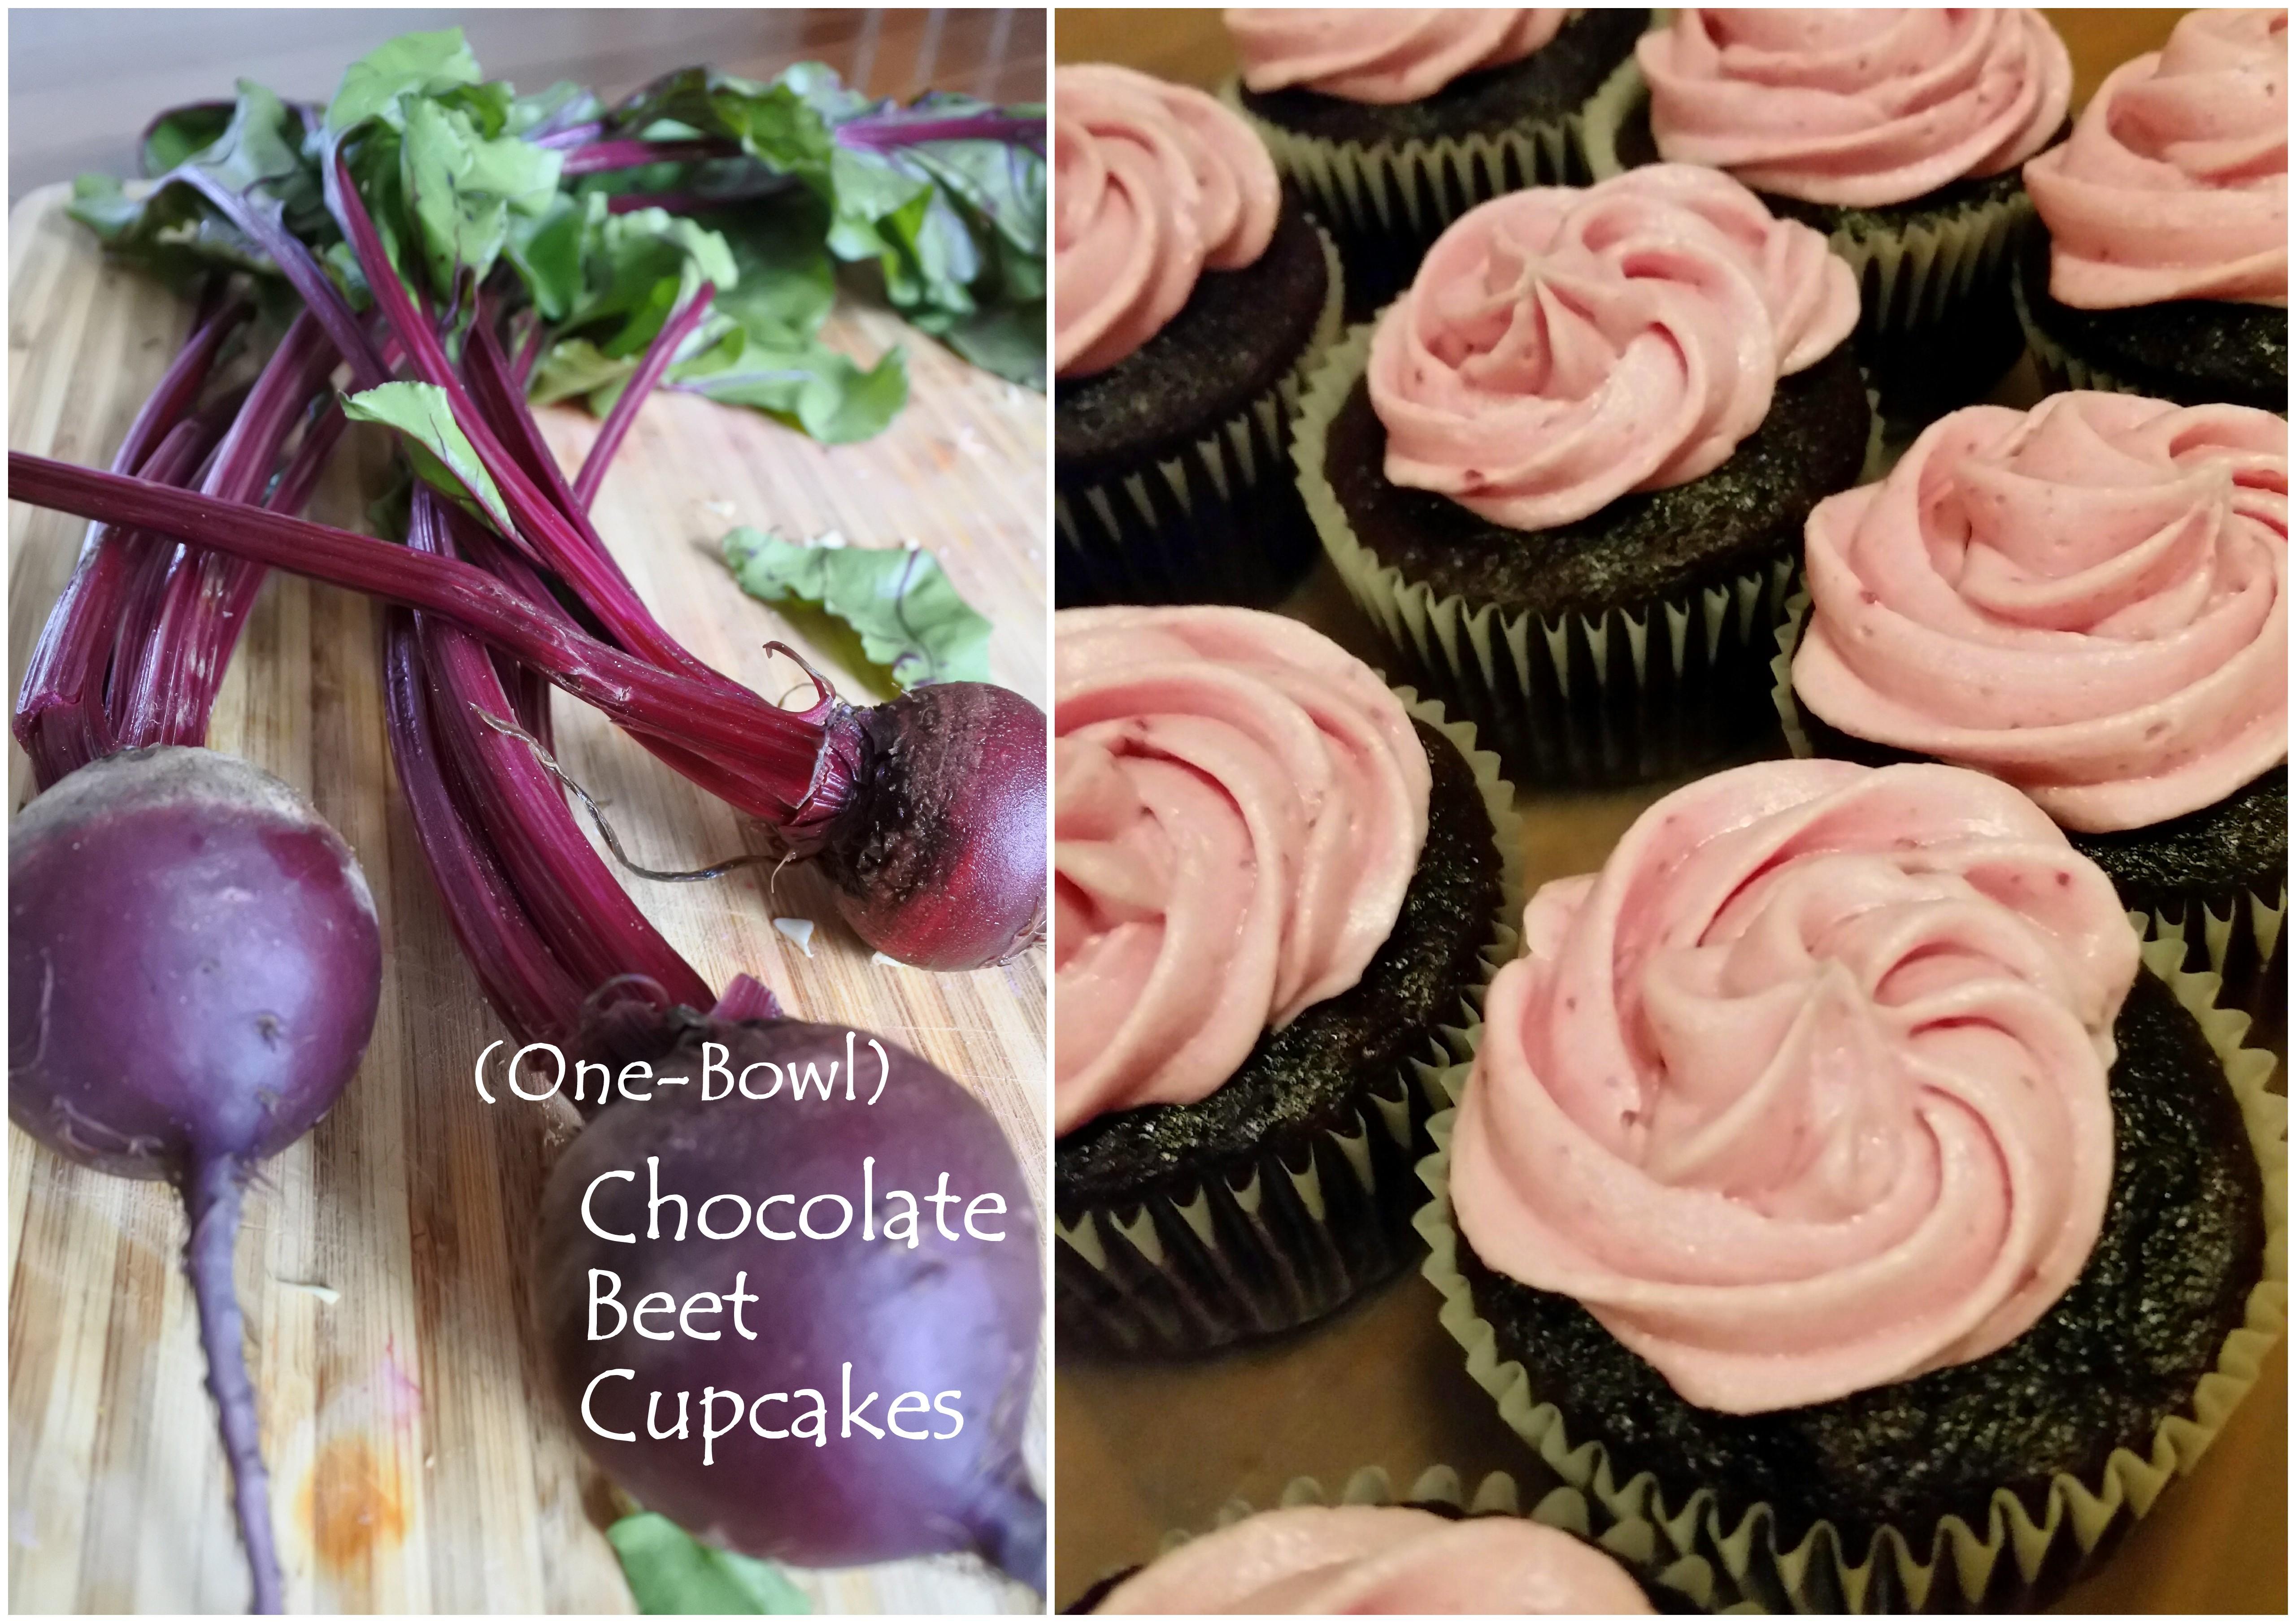 chocolate vegan beet cupcakes cake recipe gluten-free nut-free dairy-free grain-free